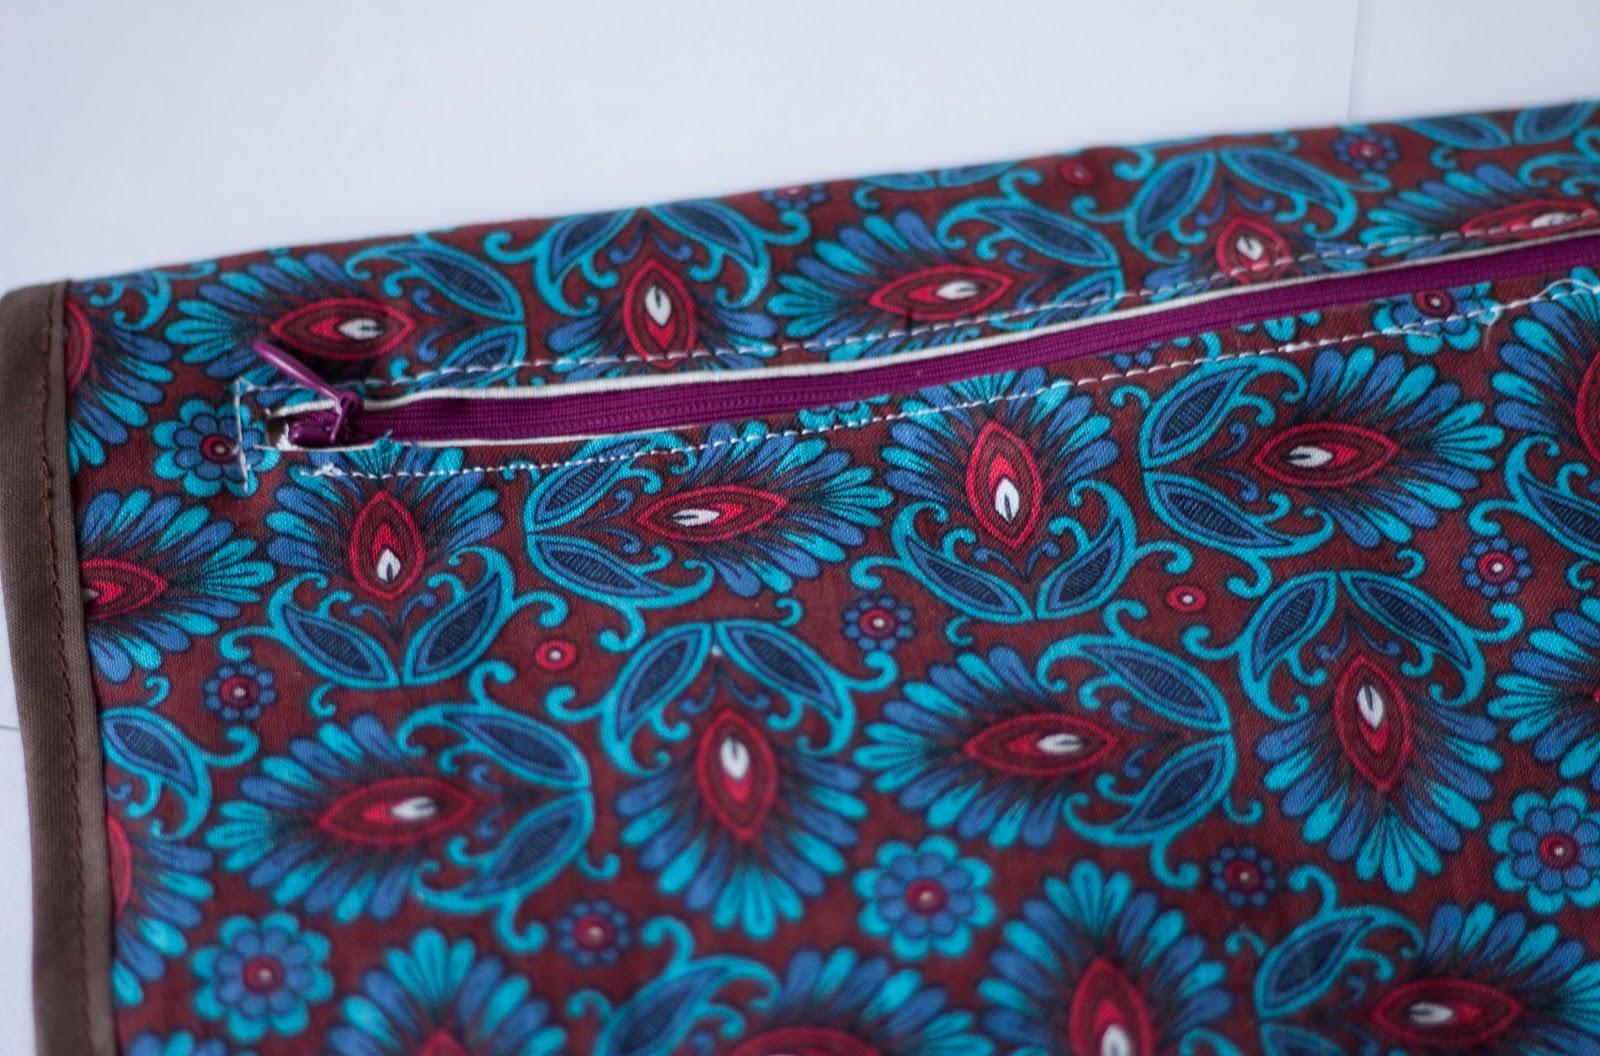 aufbewahrung rundstricknadeln diy selber nähen knit pro